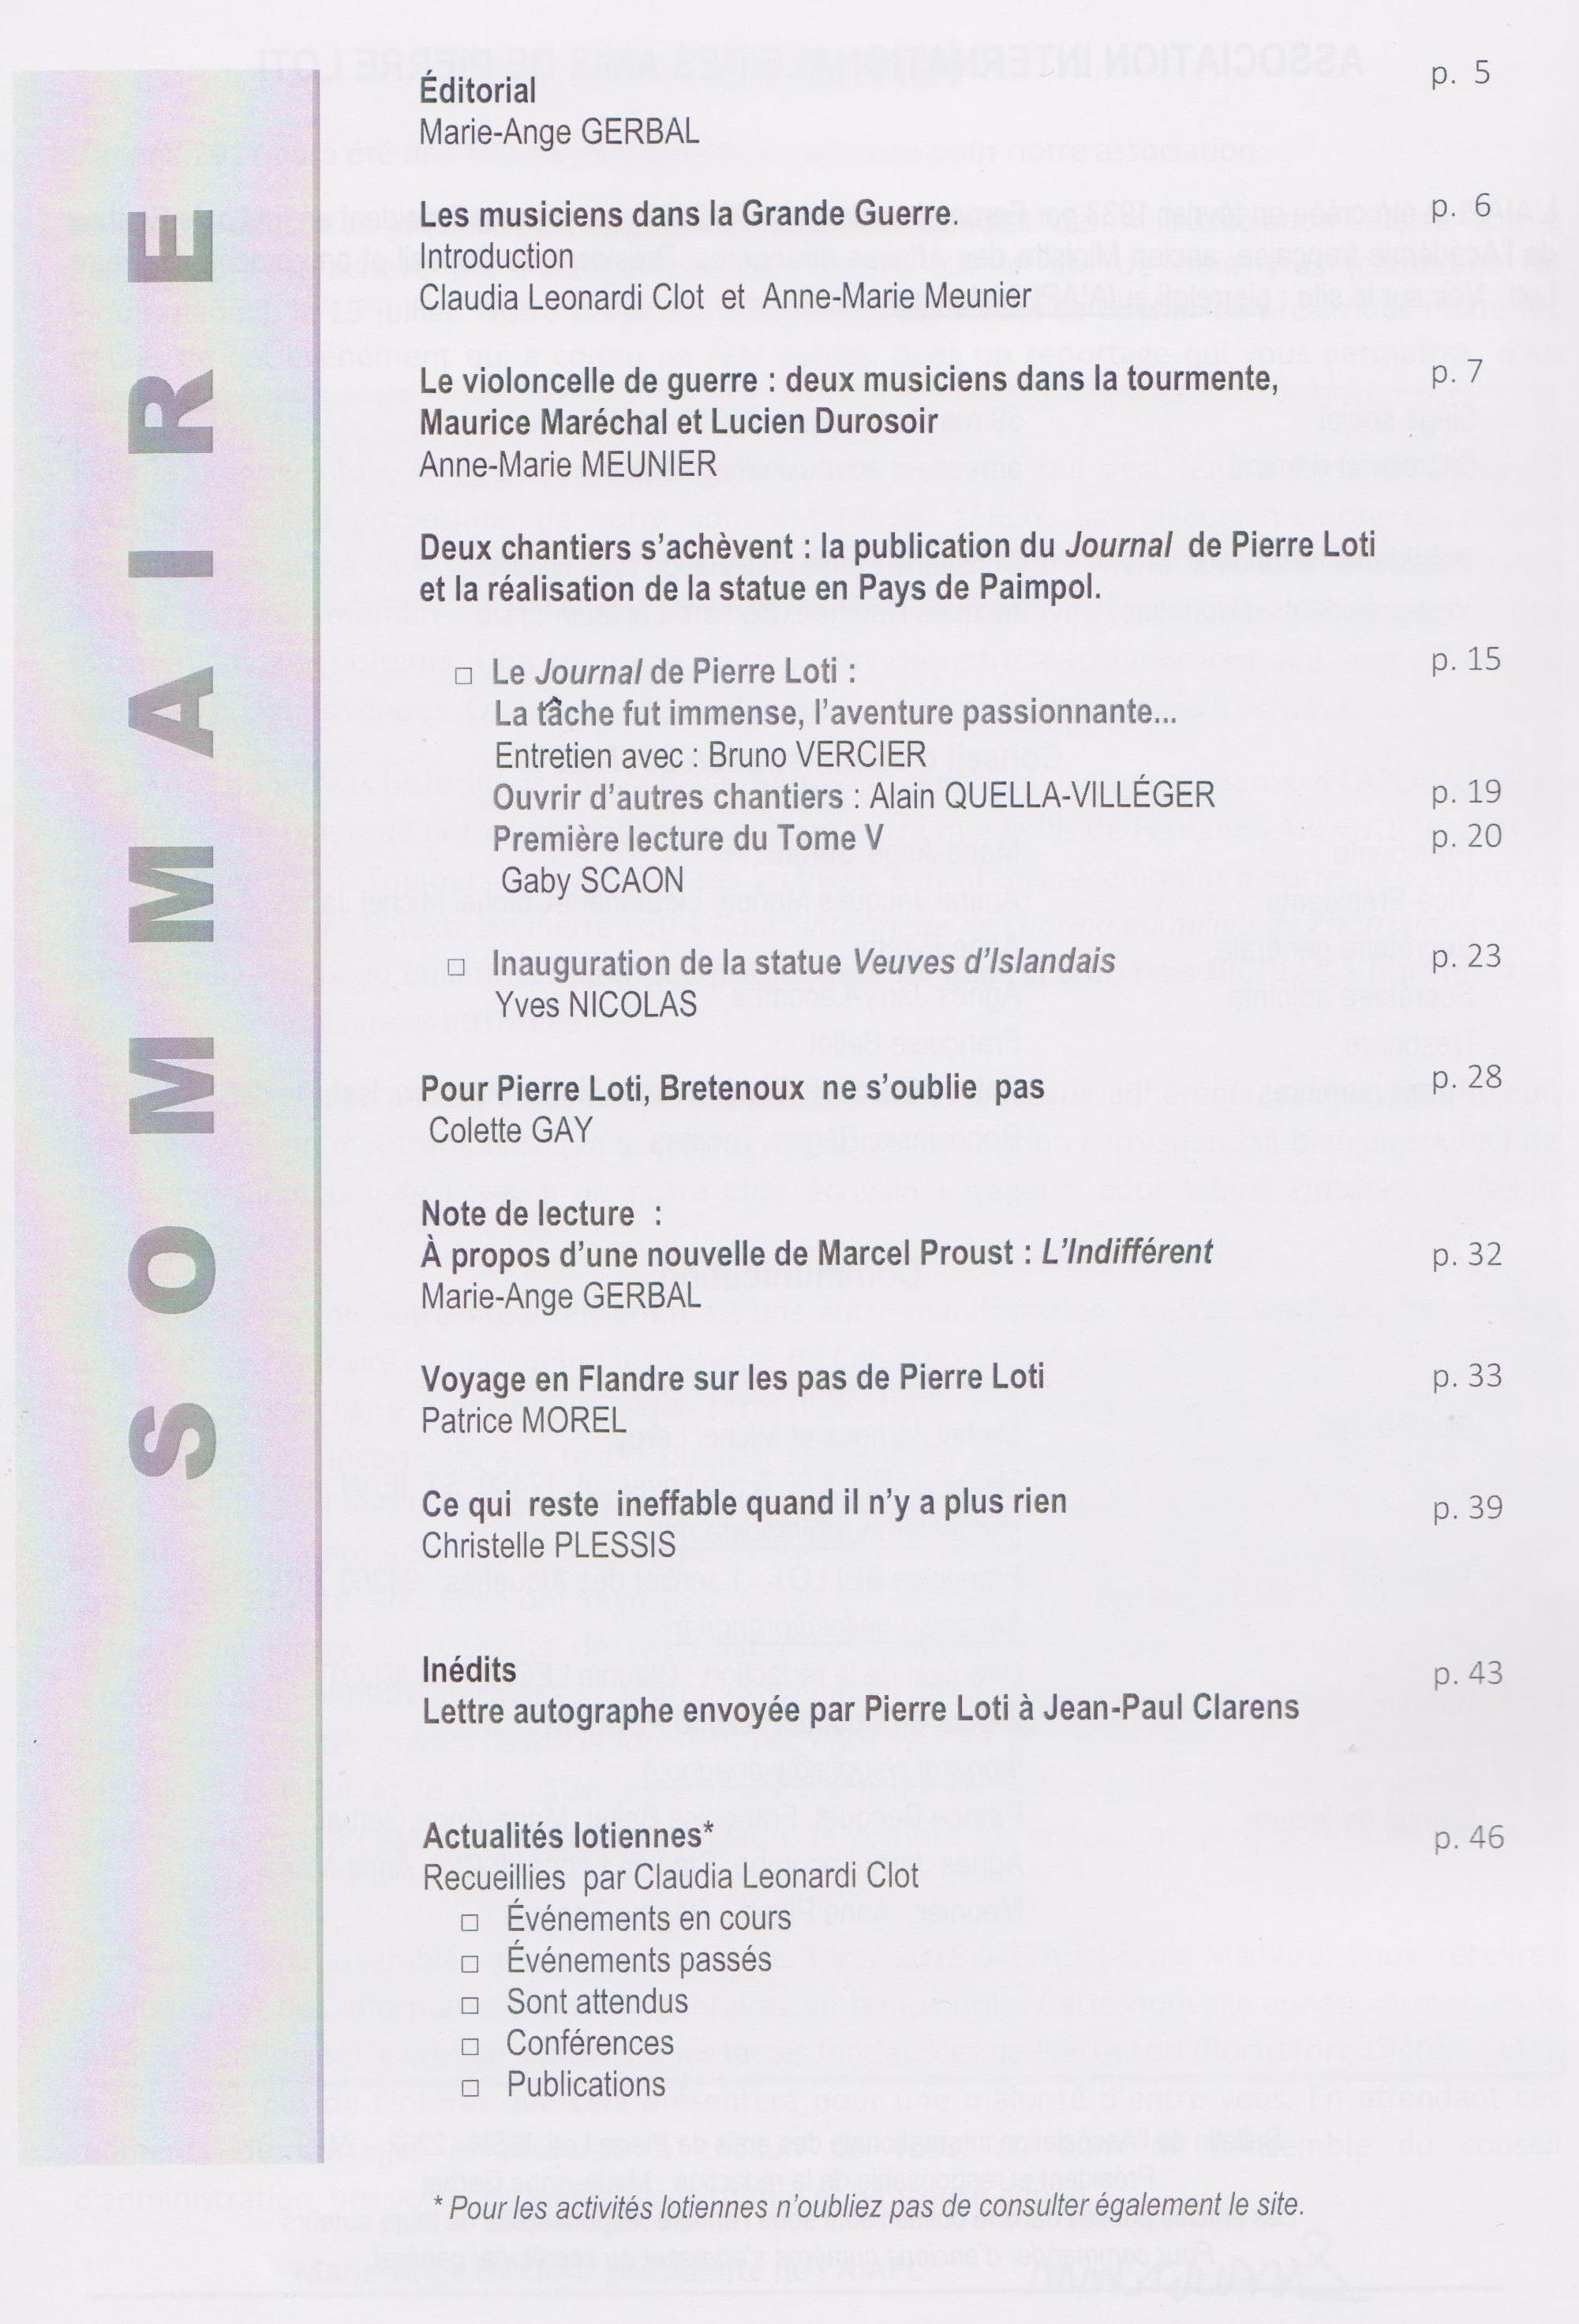 Bulletin sommaire n°37 rectifié